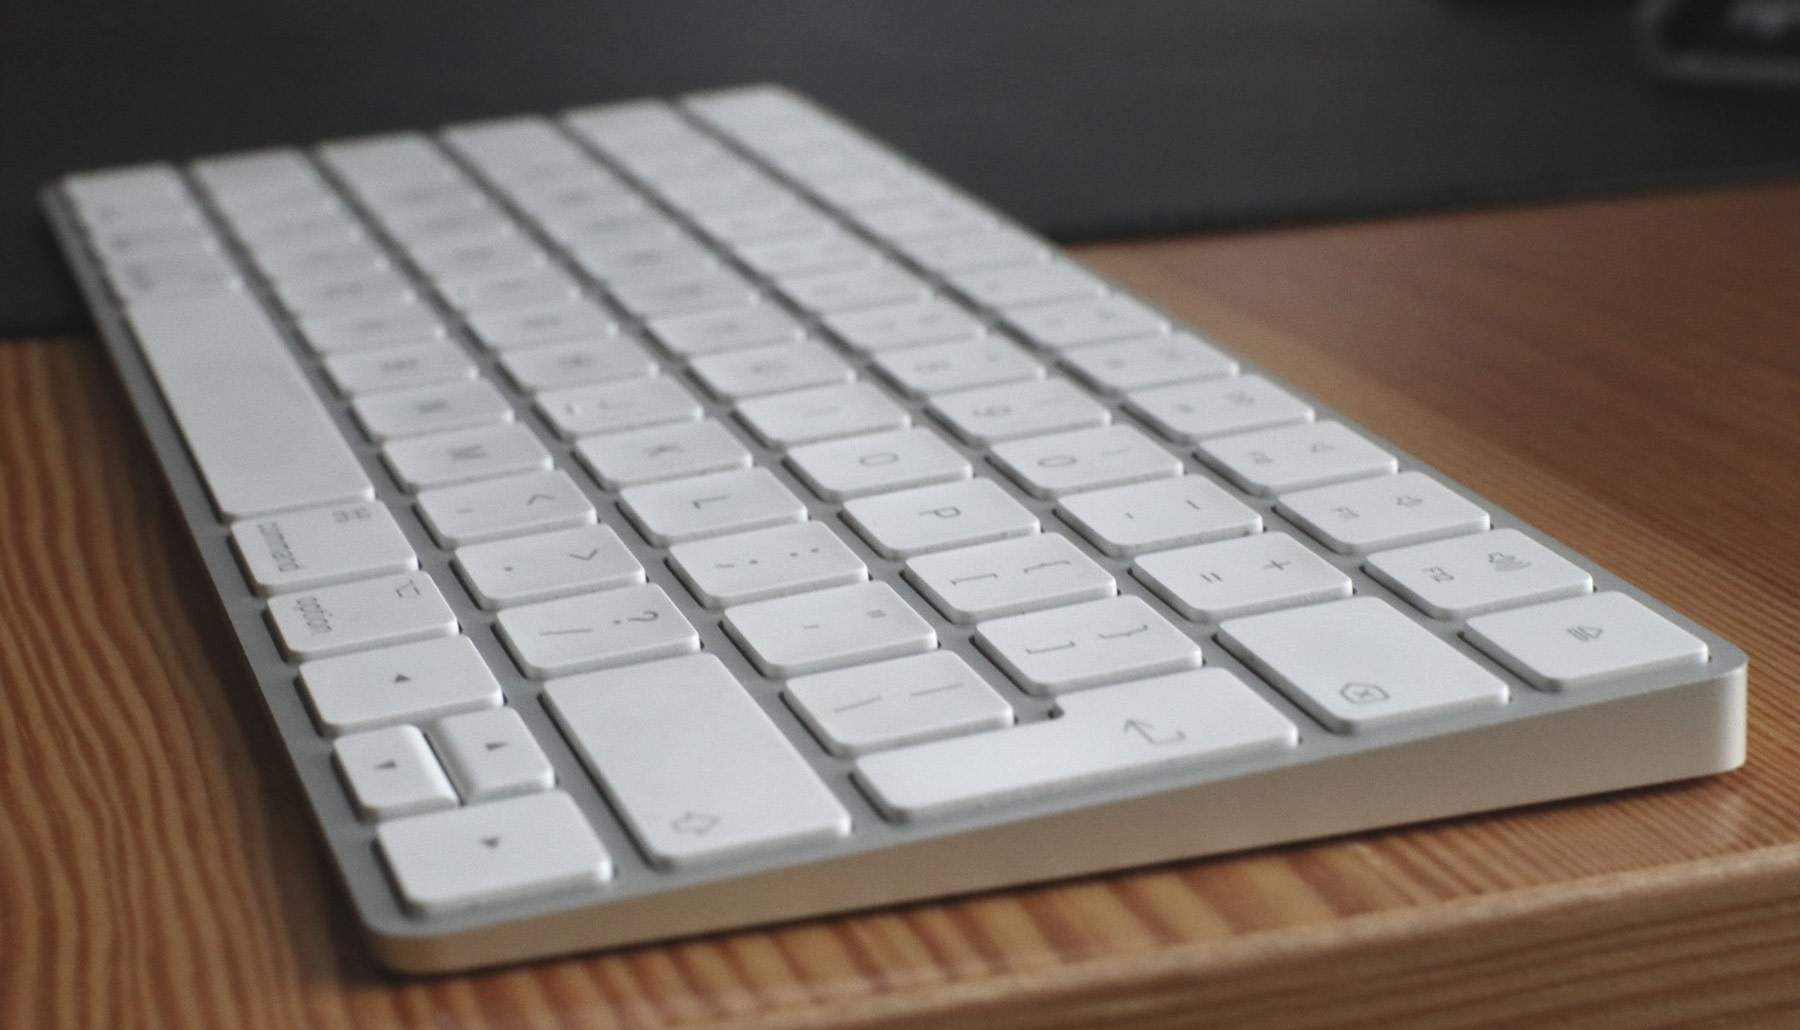 magic keyboard 3